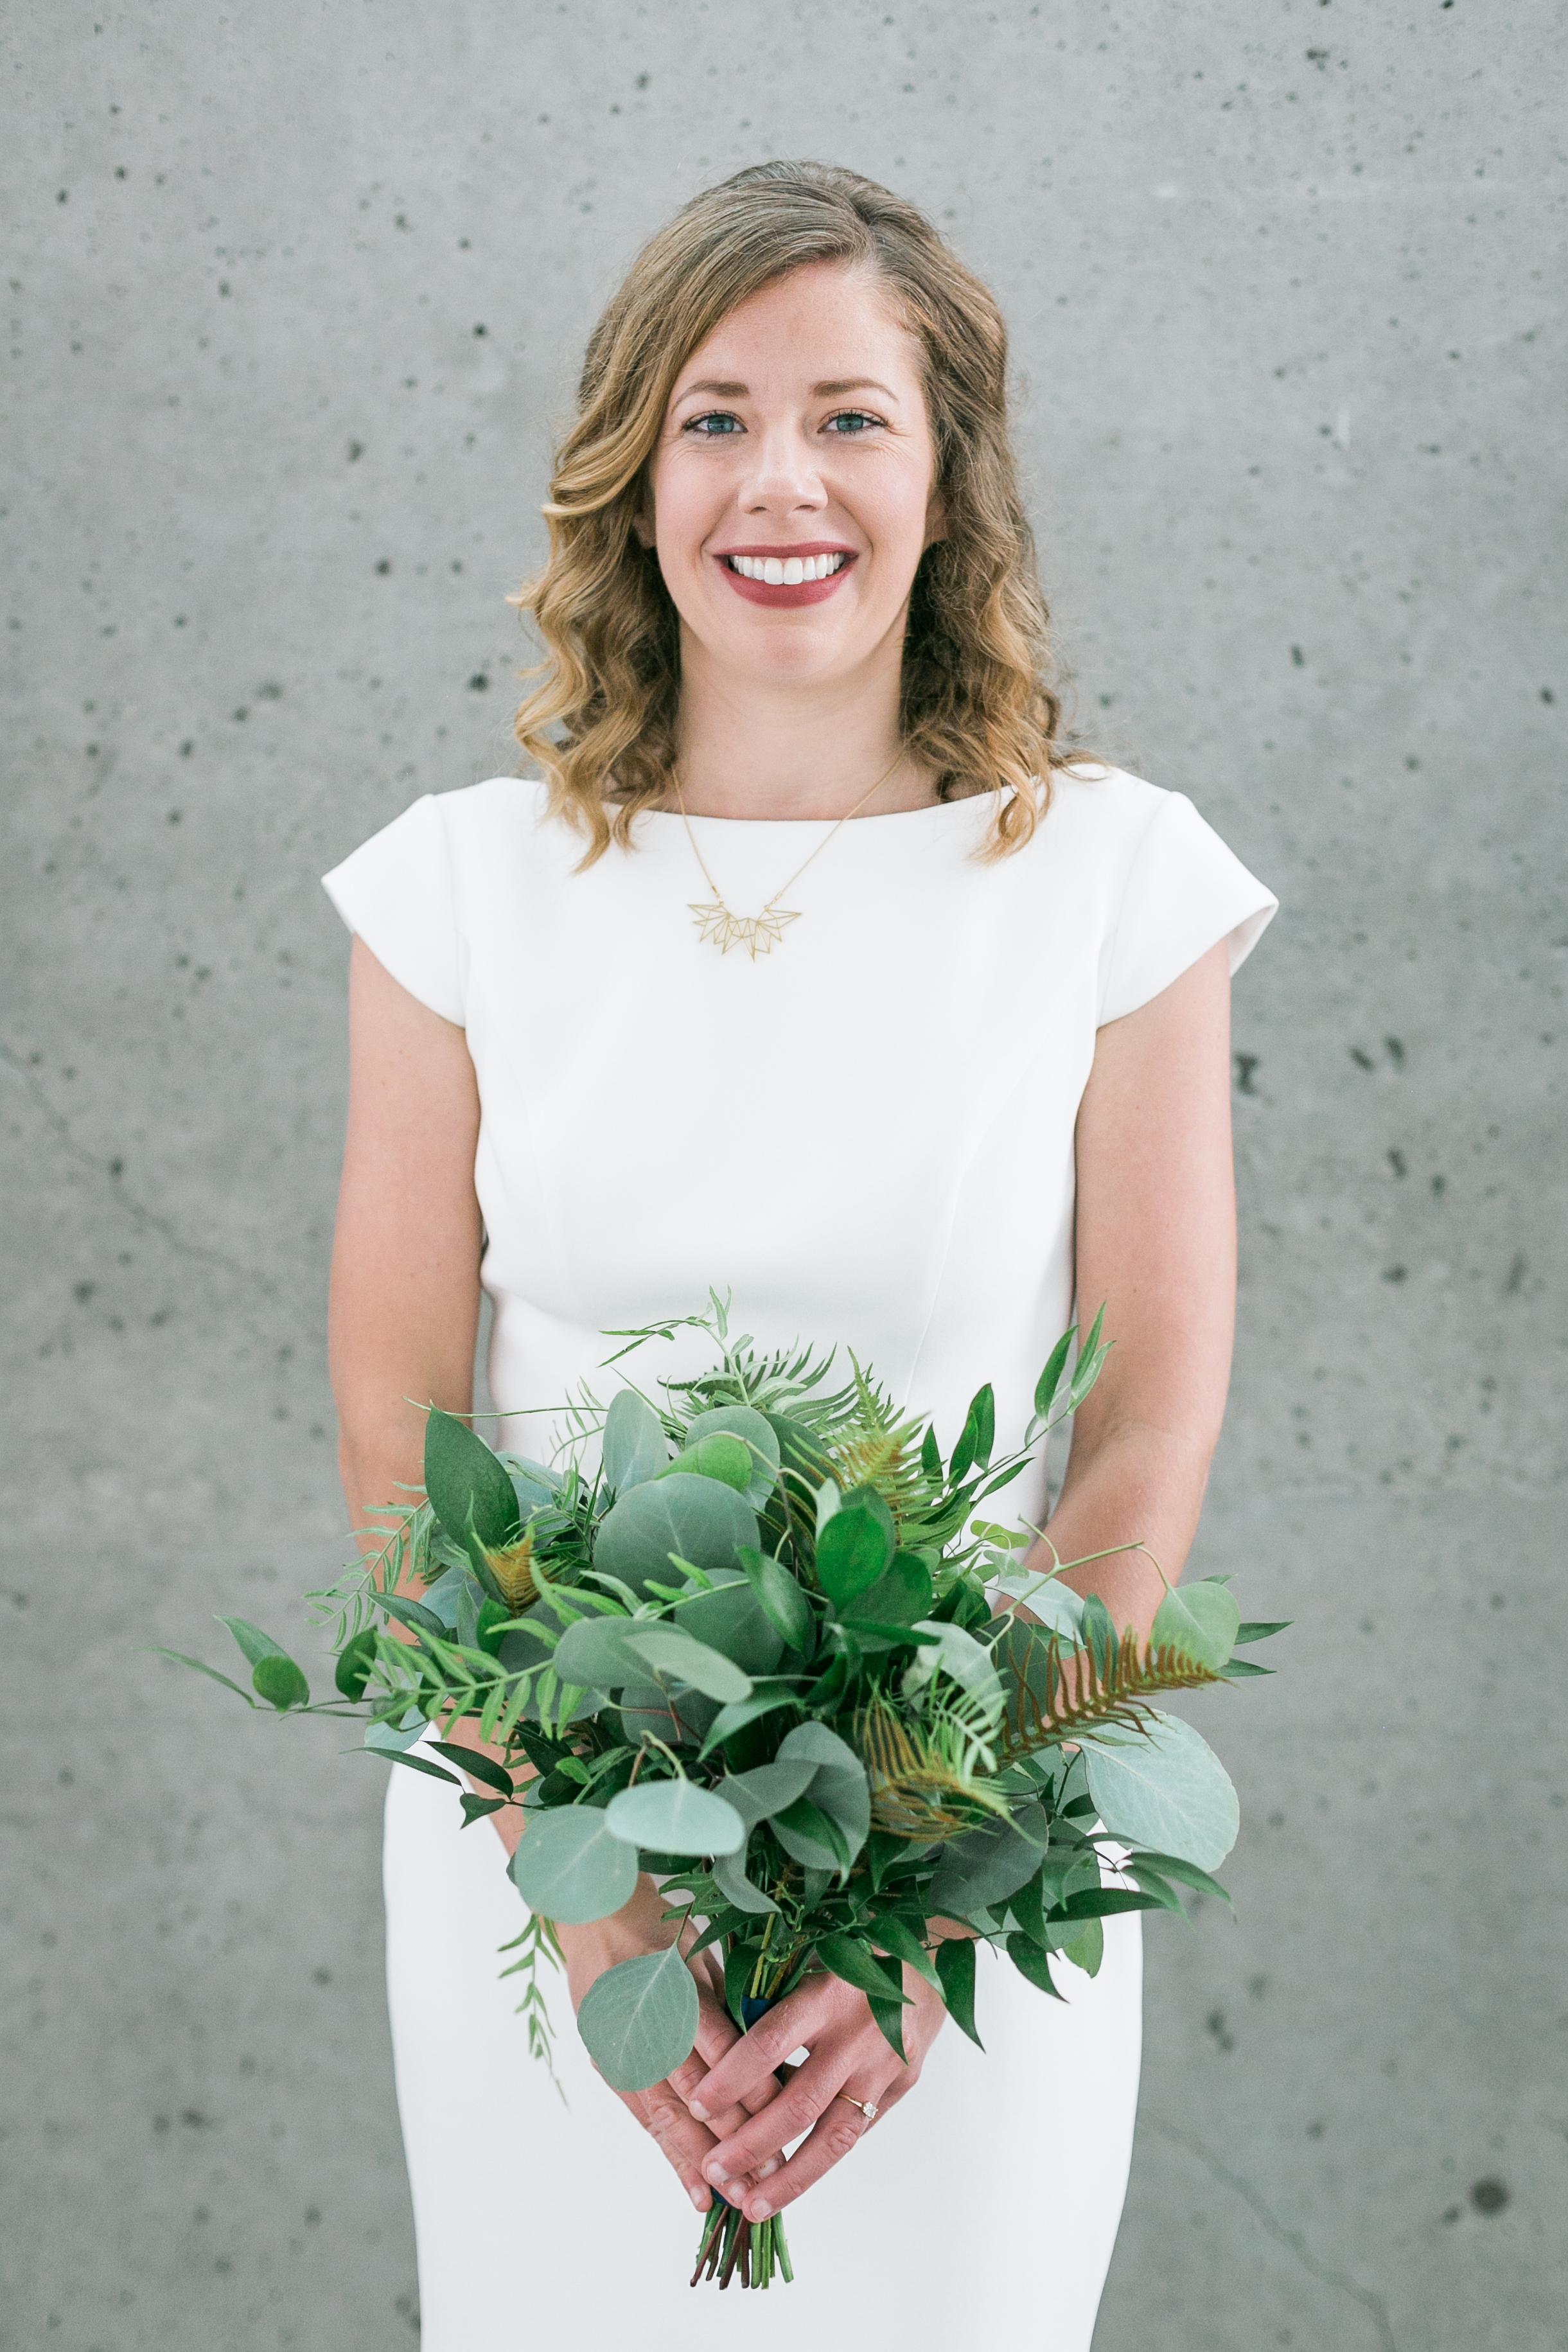 seattle-wedding-modern-bridal-bouquet-greenery-white